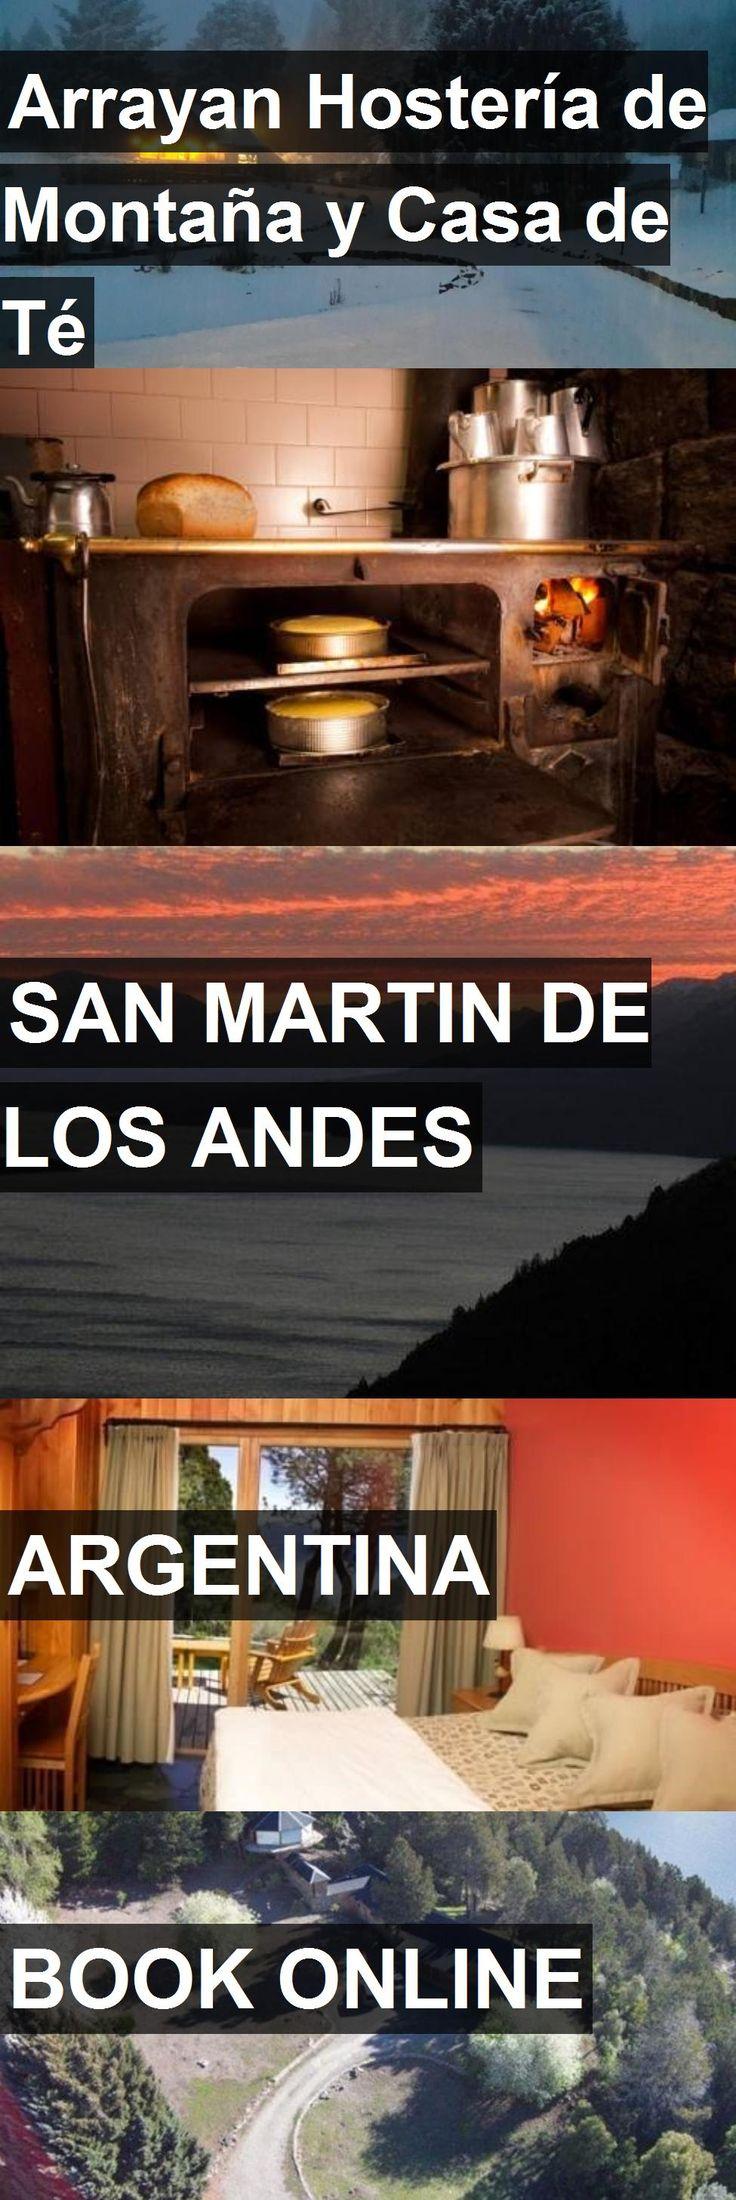 Hotel Arrayan Hostería de Montaña y Casa de Té in San Martin De Los Andes, Argentina. For more information, photos, reviews and best prices please follow the link. #Argentina #SanMartinDeLosAndes #travel #vacation #hotel